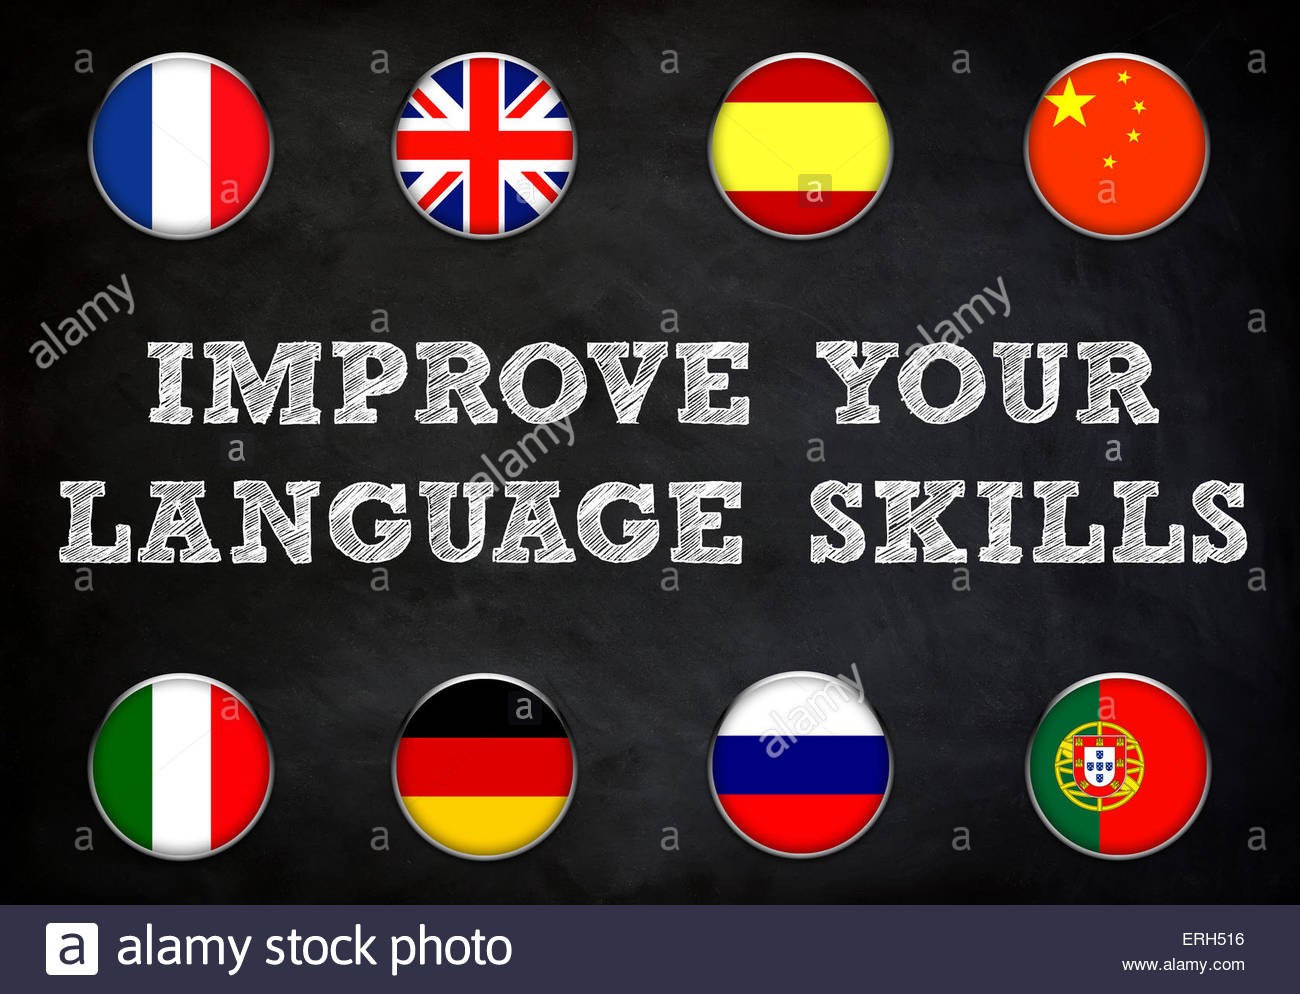 improve your language skills - blackboard illustration - Stock Image